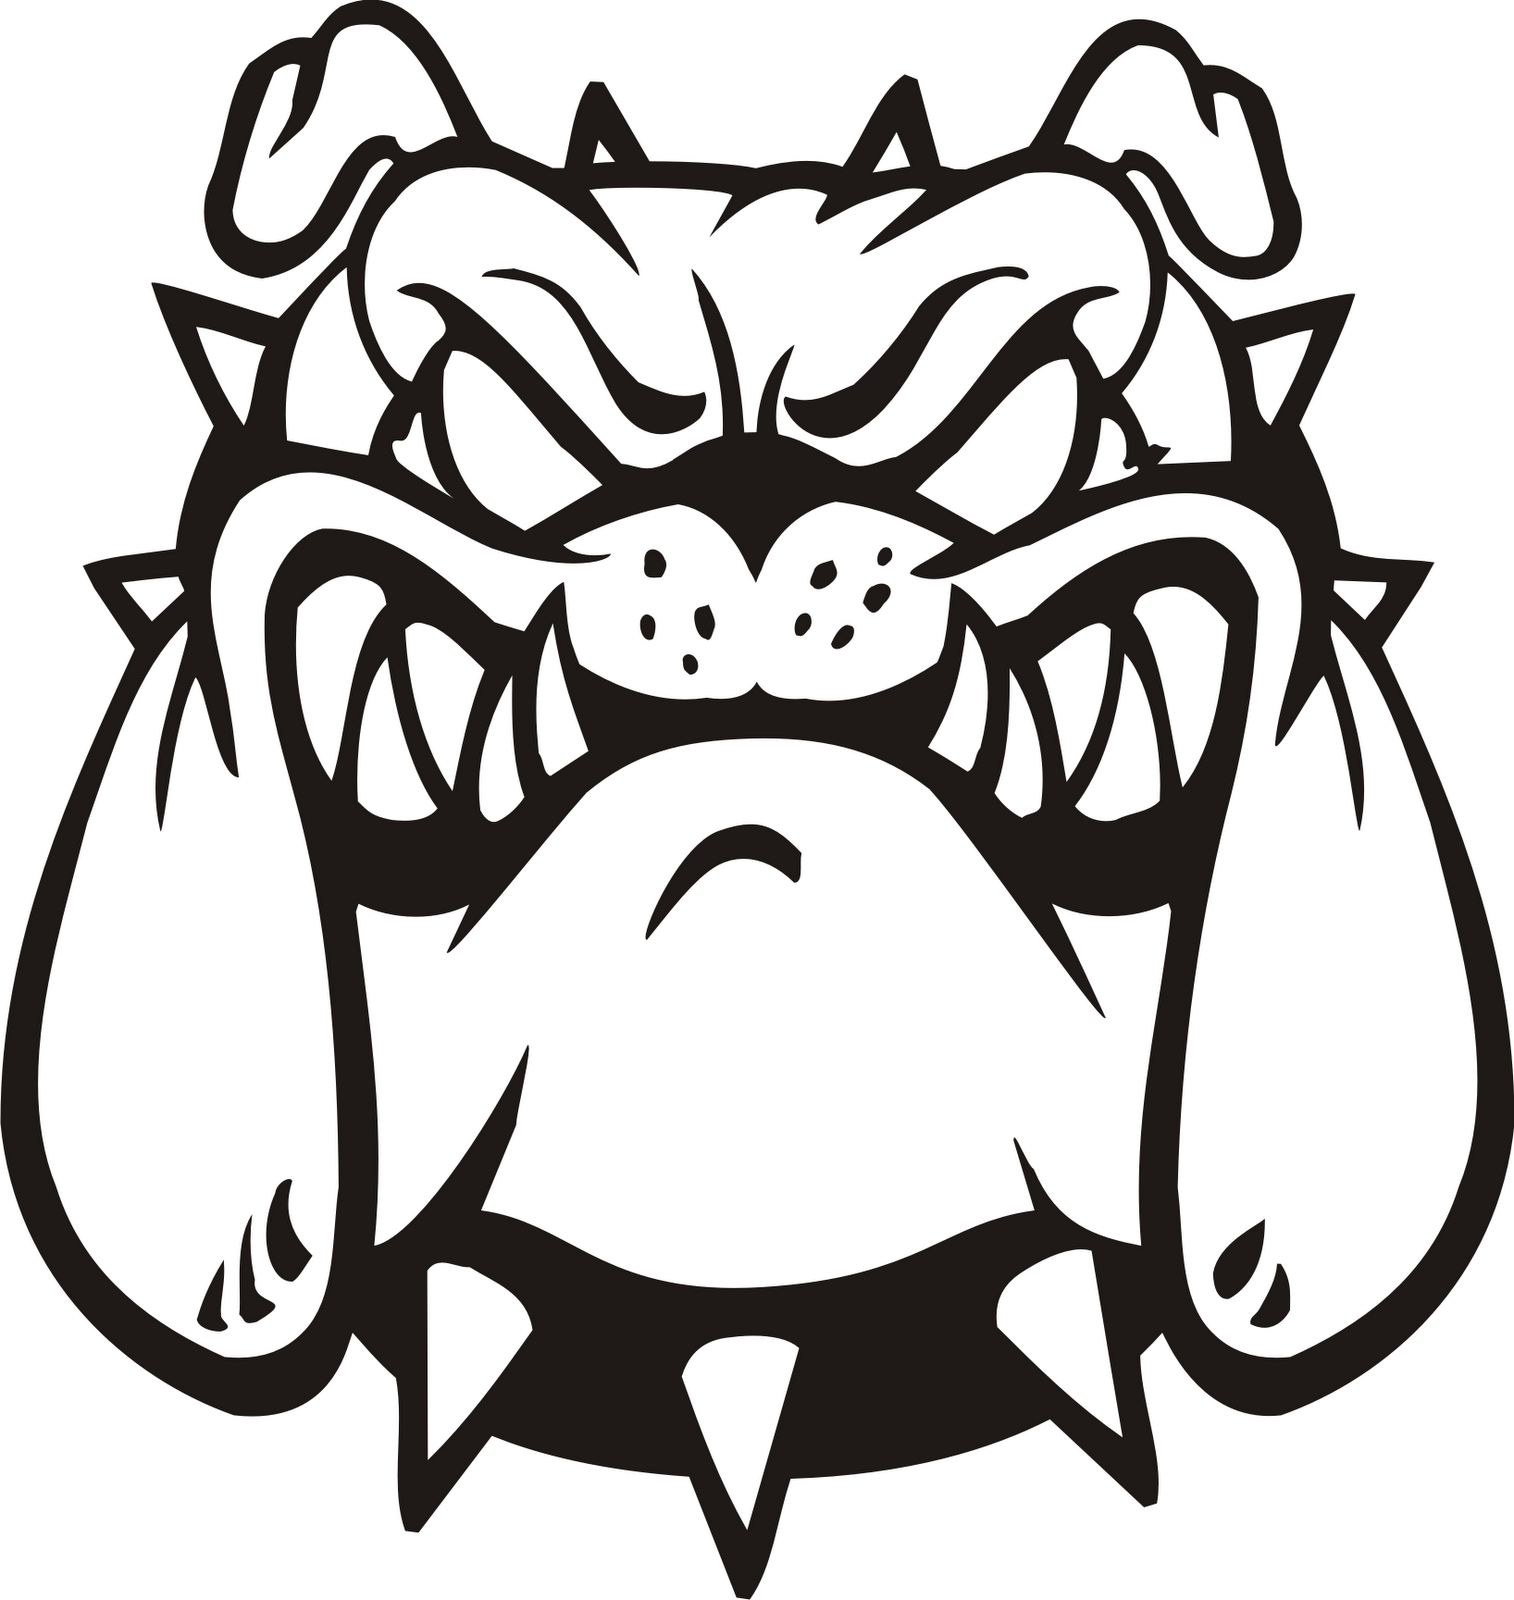 264375440600577676 in addition Bulldog Vector likewise Bulldog Mascot Clipart additionally Drawing as well Stencilindex. on uga bulldog symbol